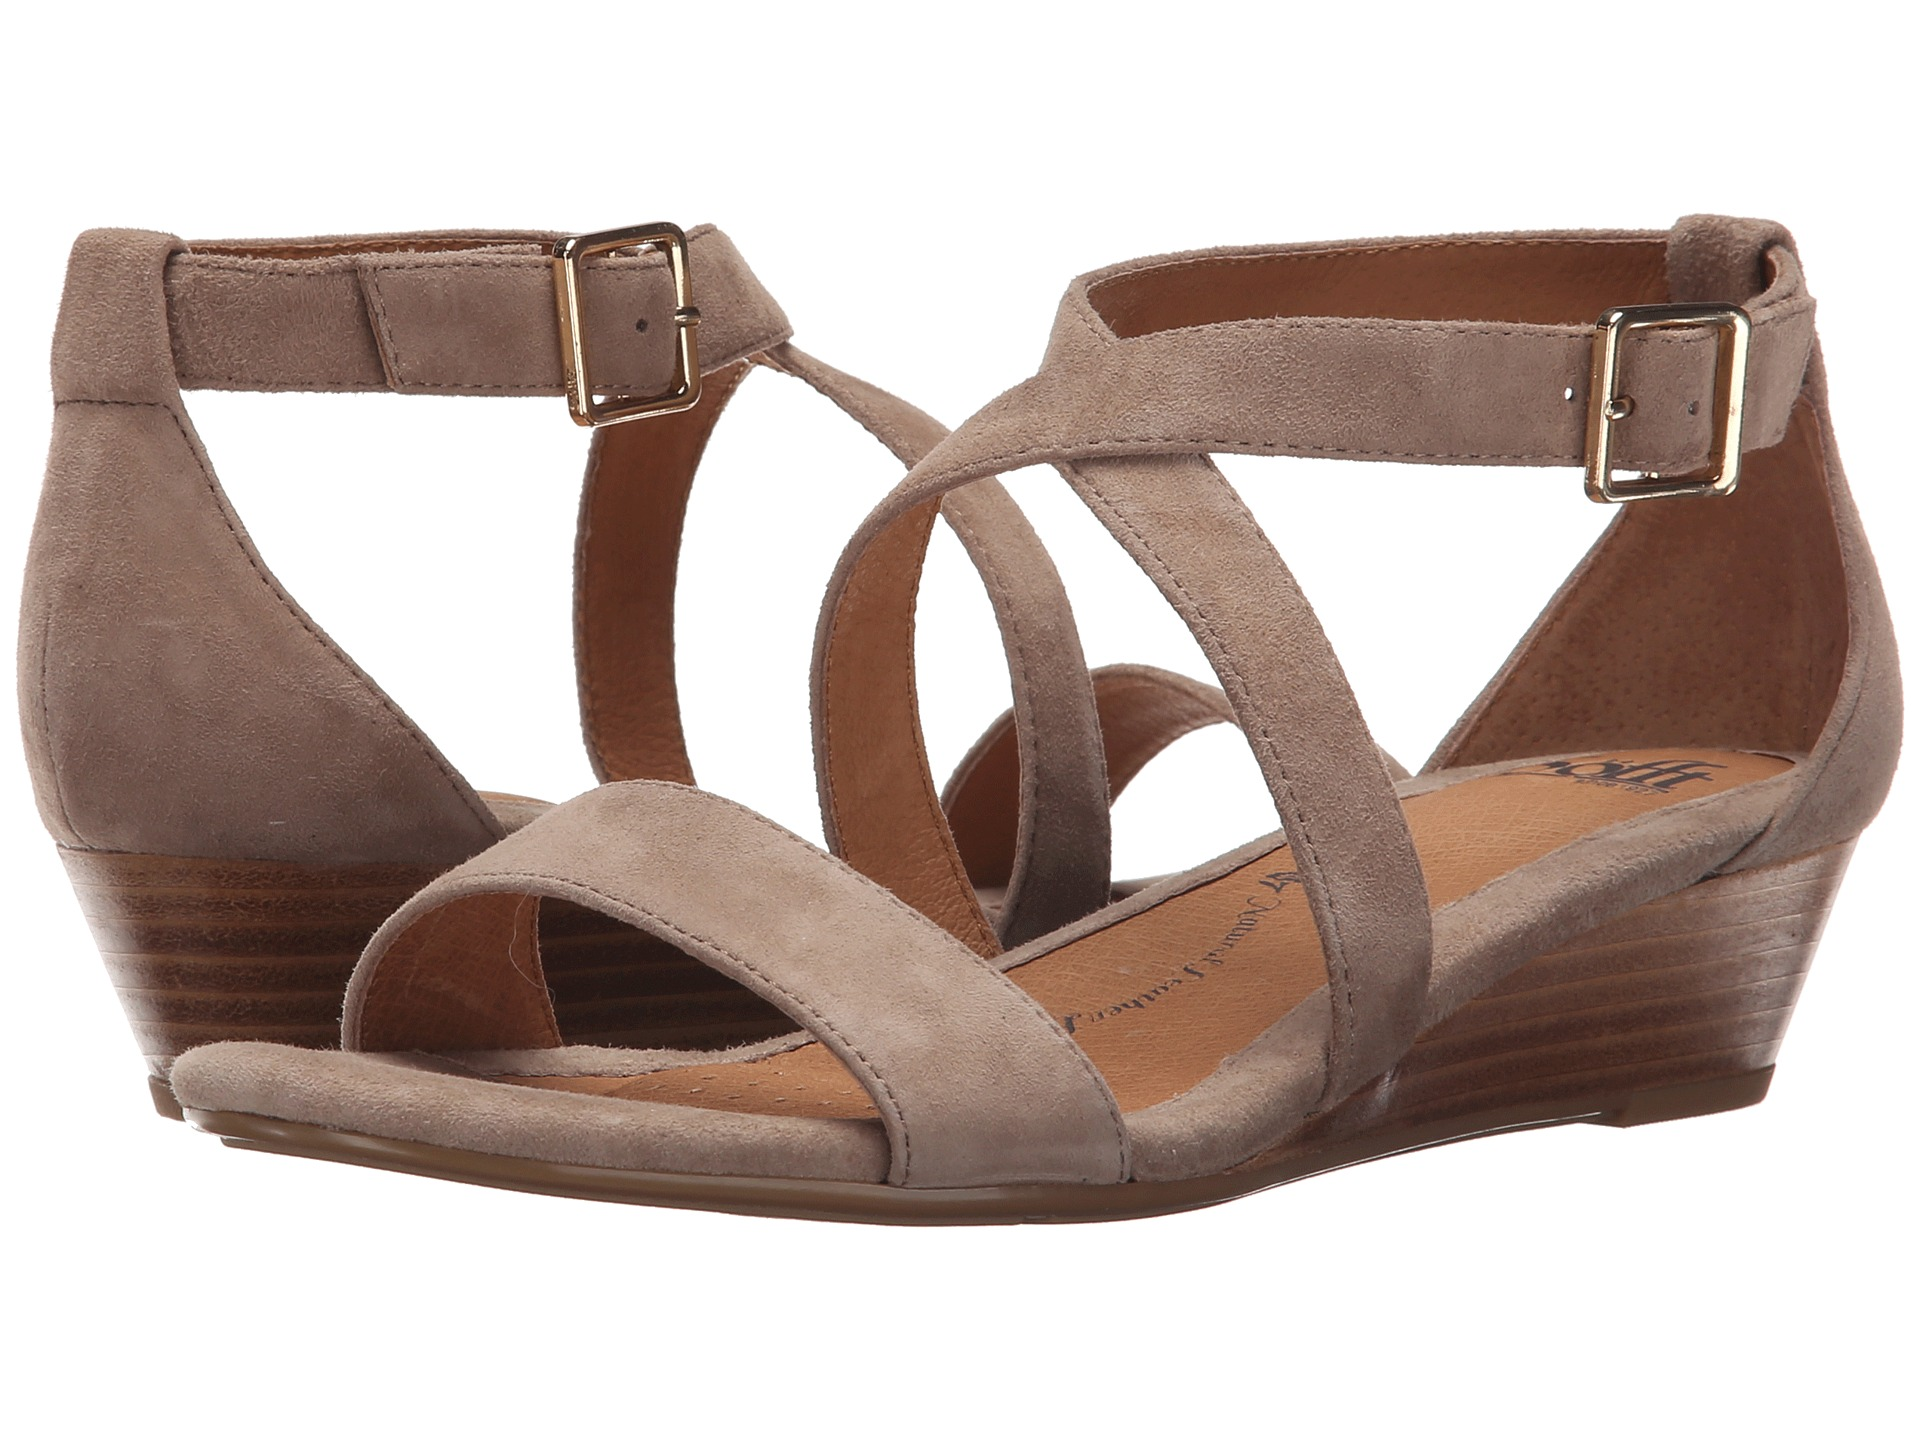 Sandals shoes comfortable - Sandals Shoes Comfortable 59